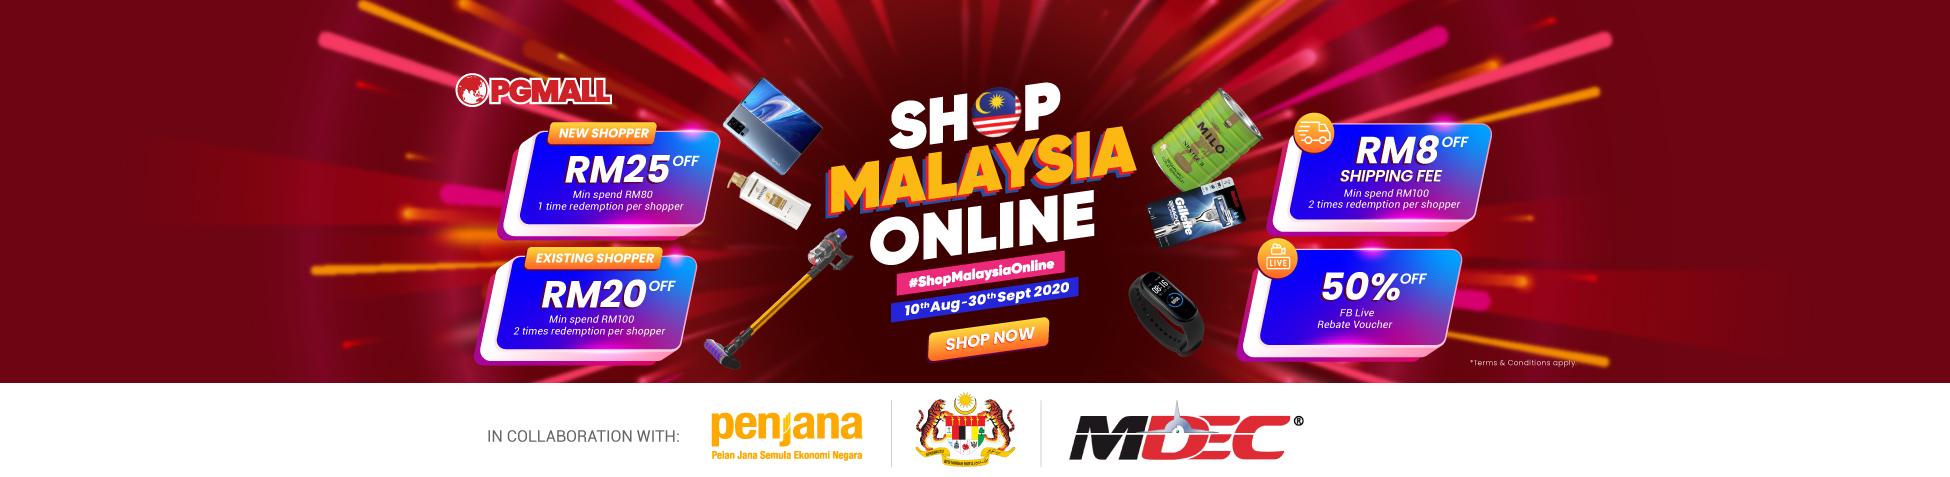 E-Penjana Shop Malaysia Online